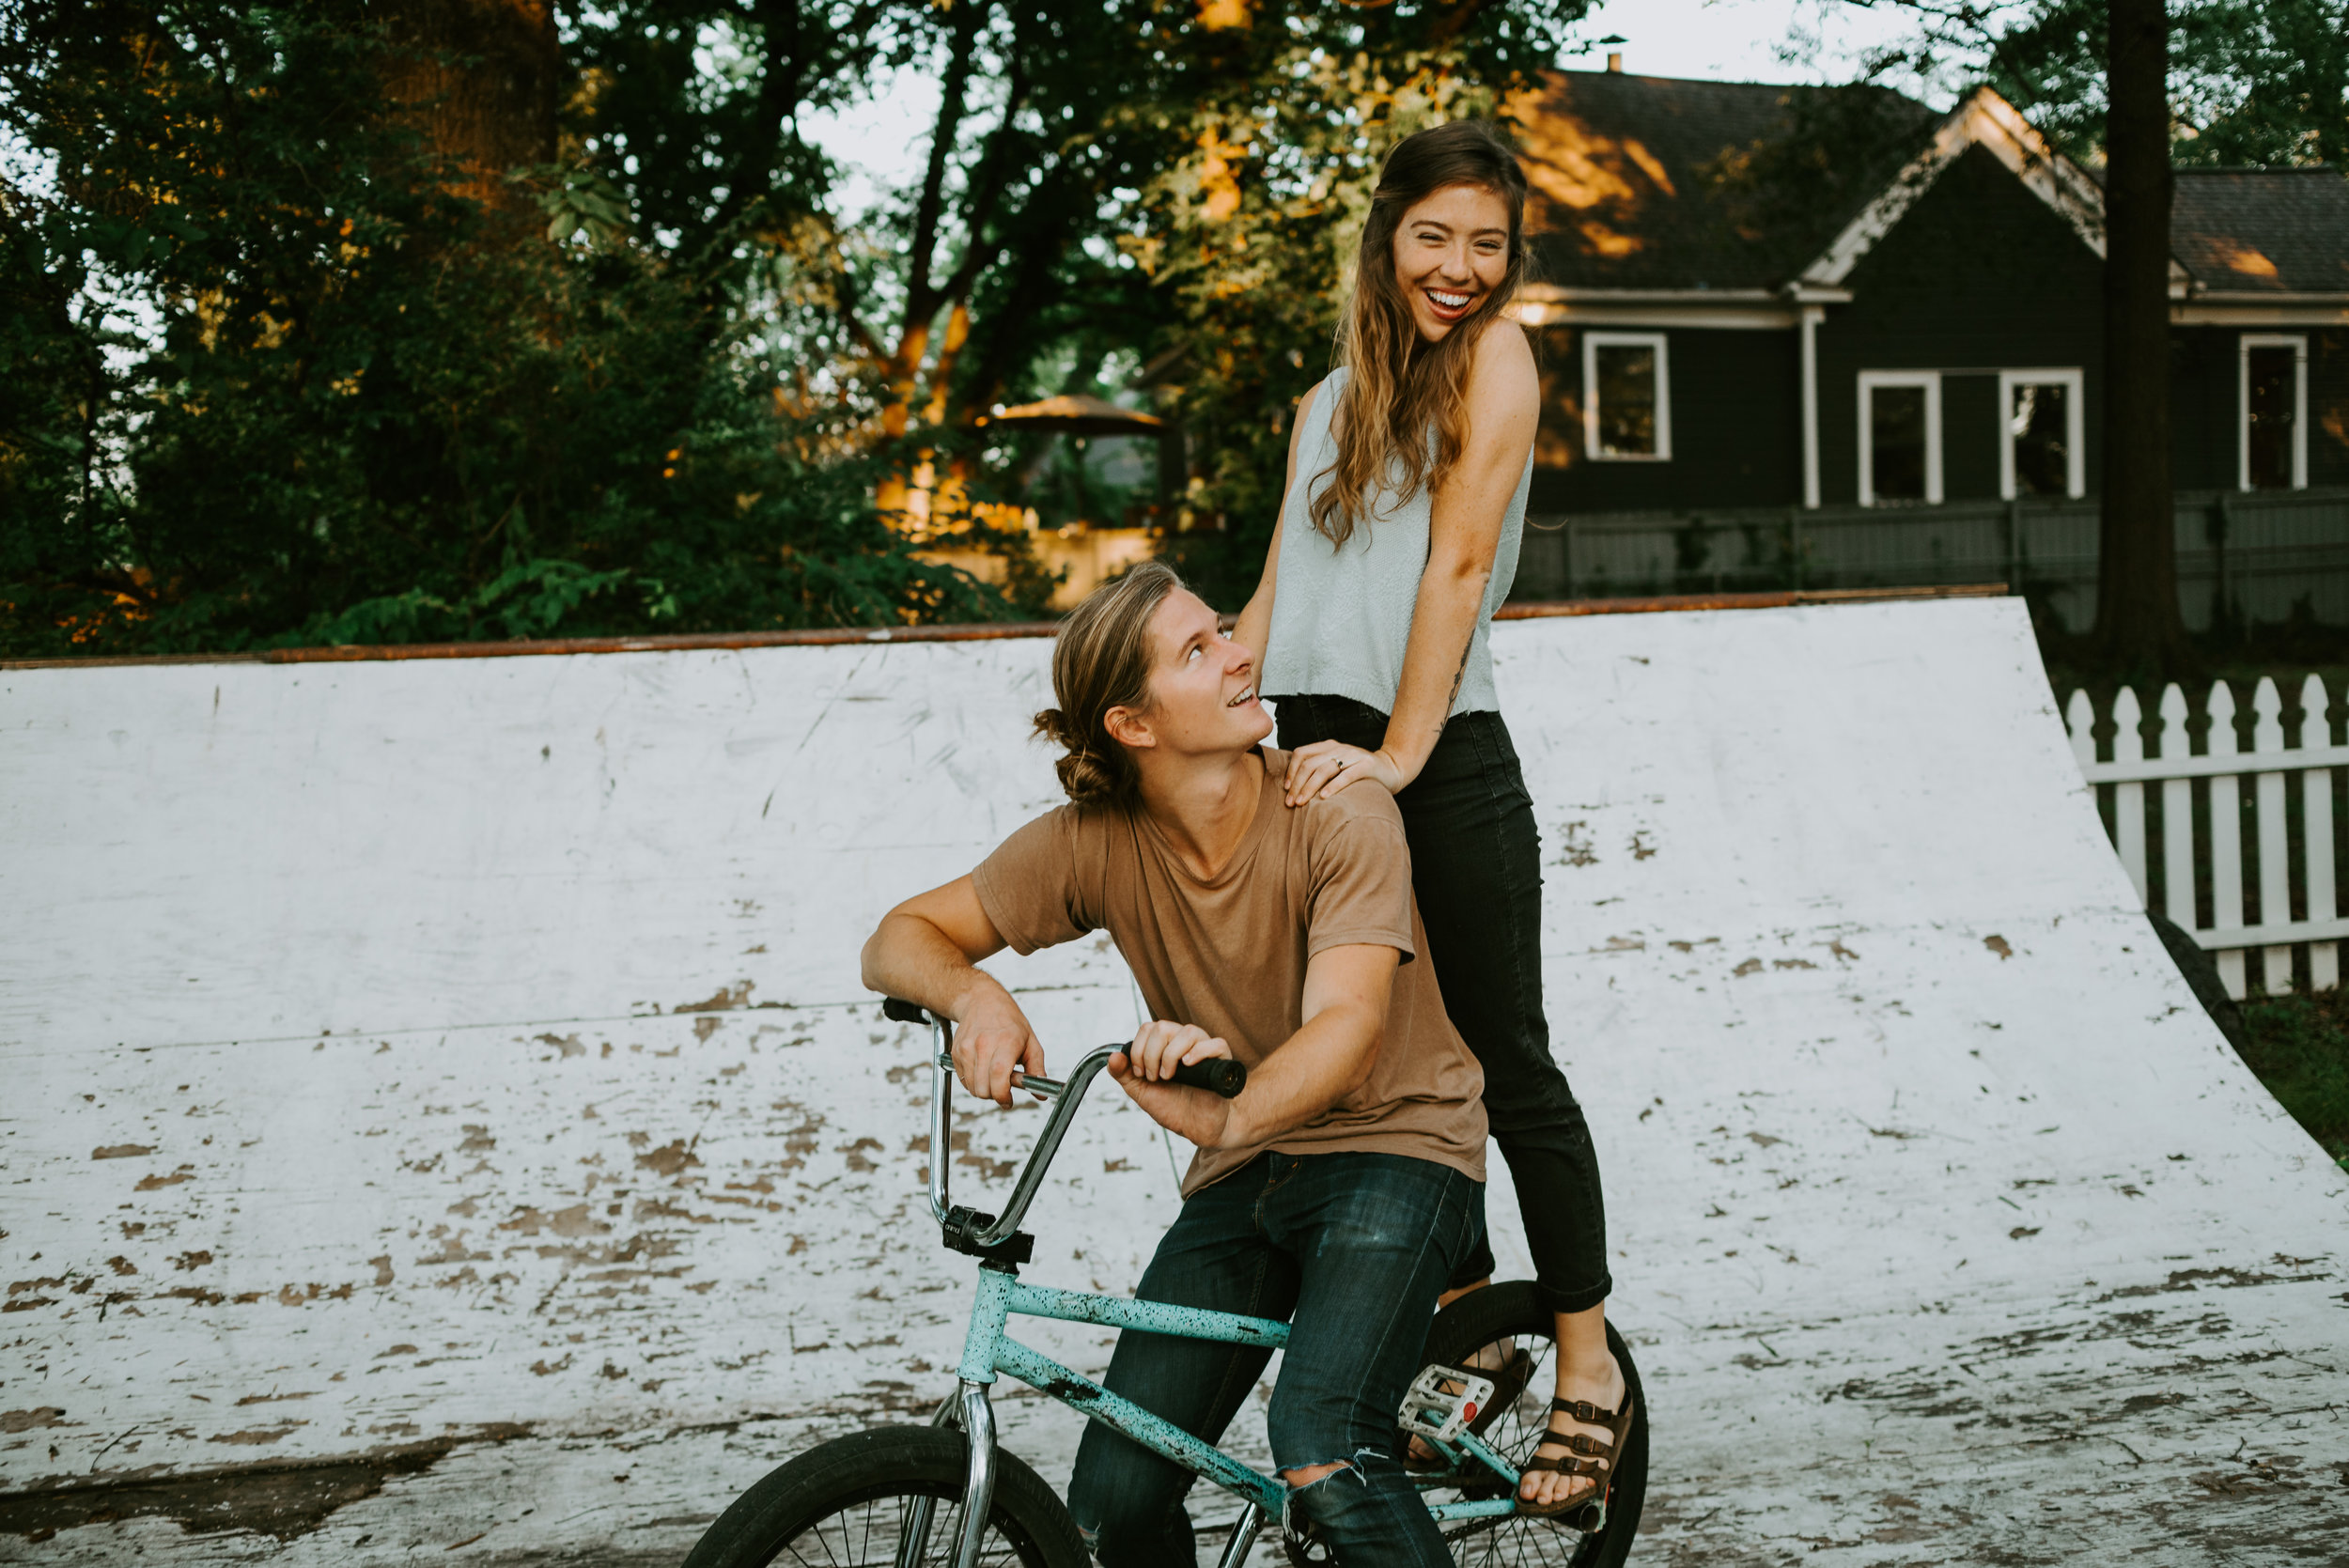 WonderlyCreative_Couples_7.9.18_Cameron&Alexis_-195.jpg